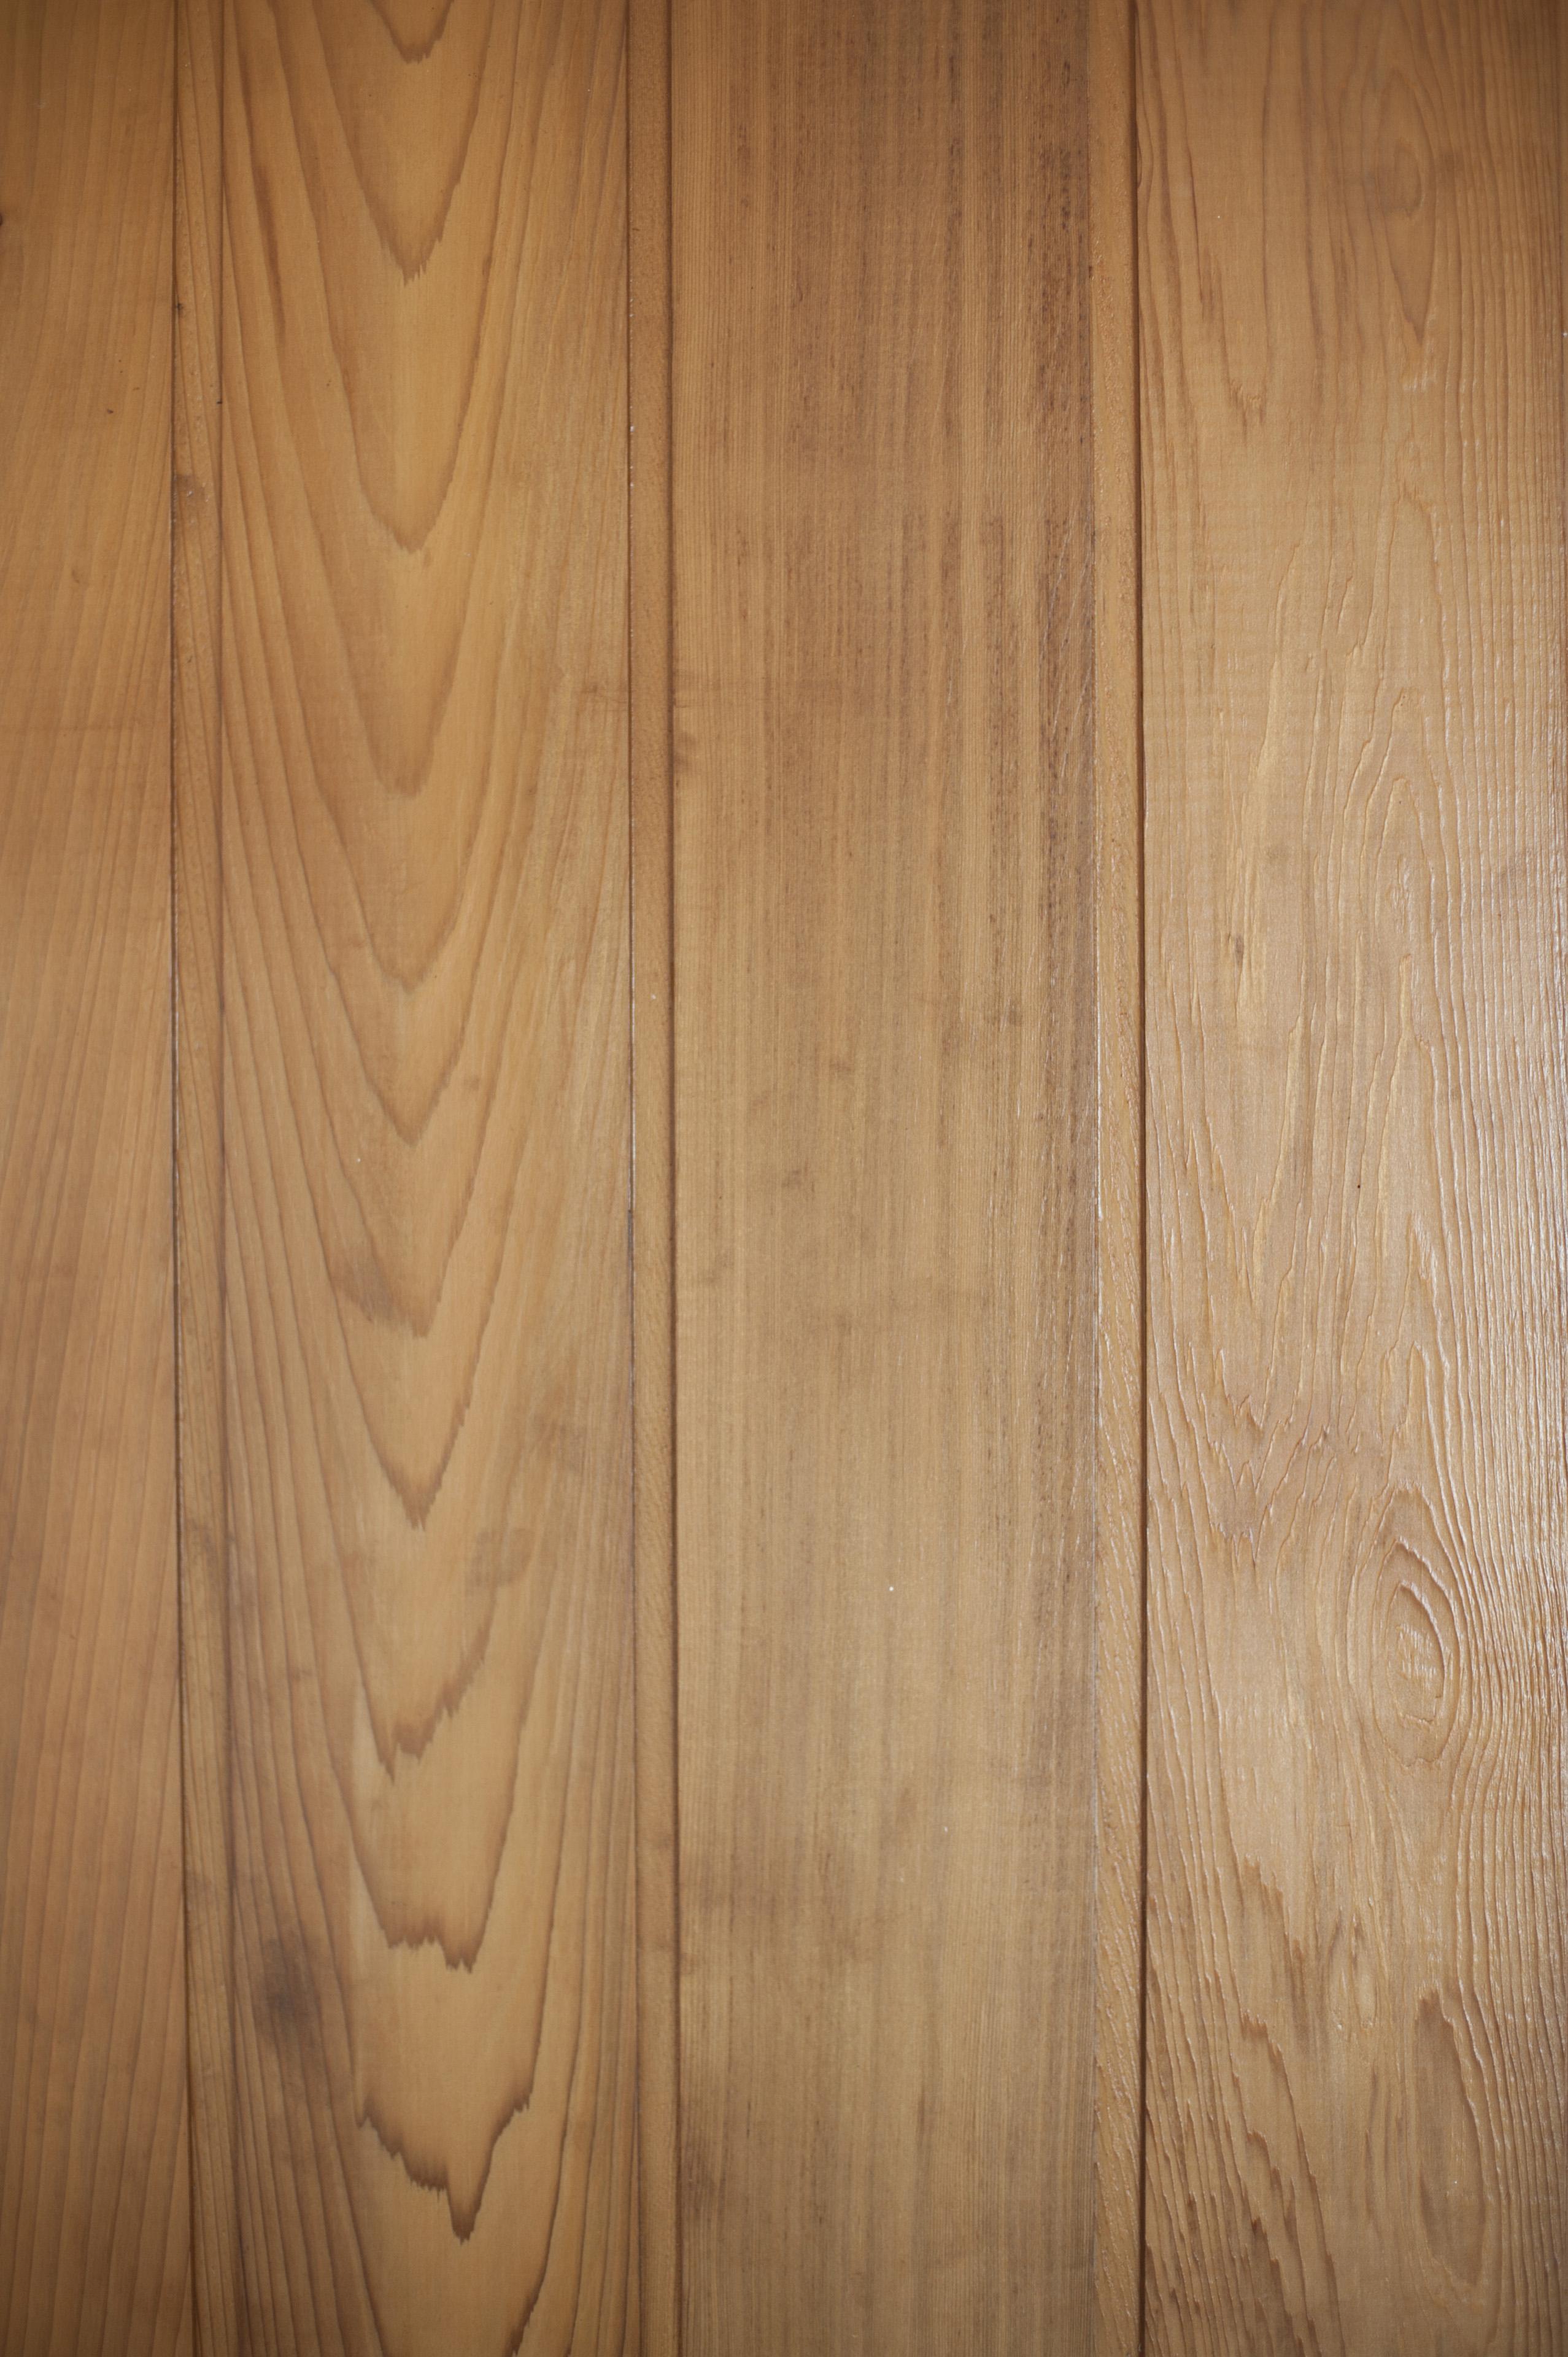 Image of wood panel texture freebie photography